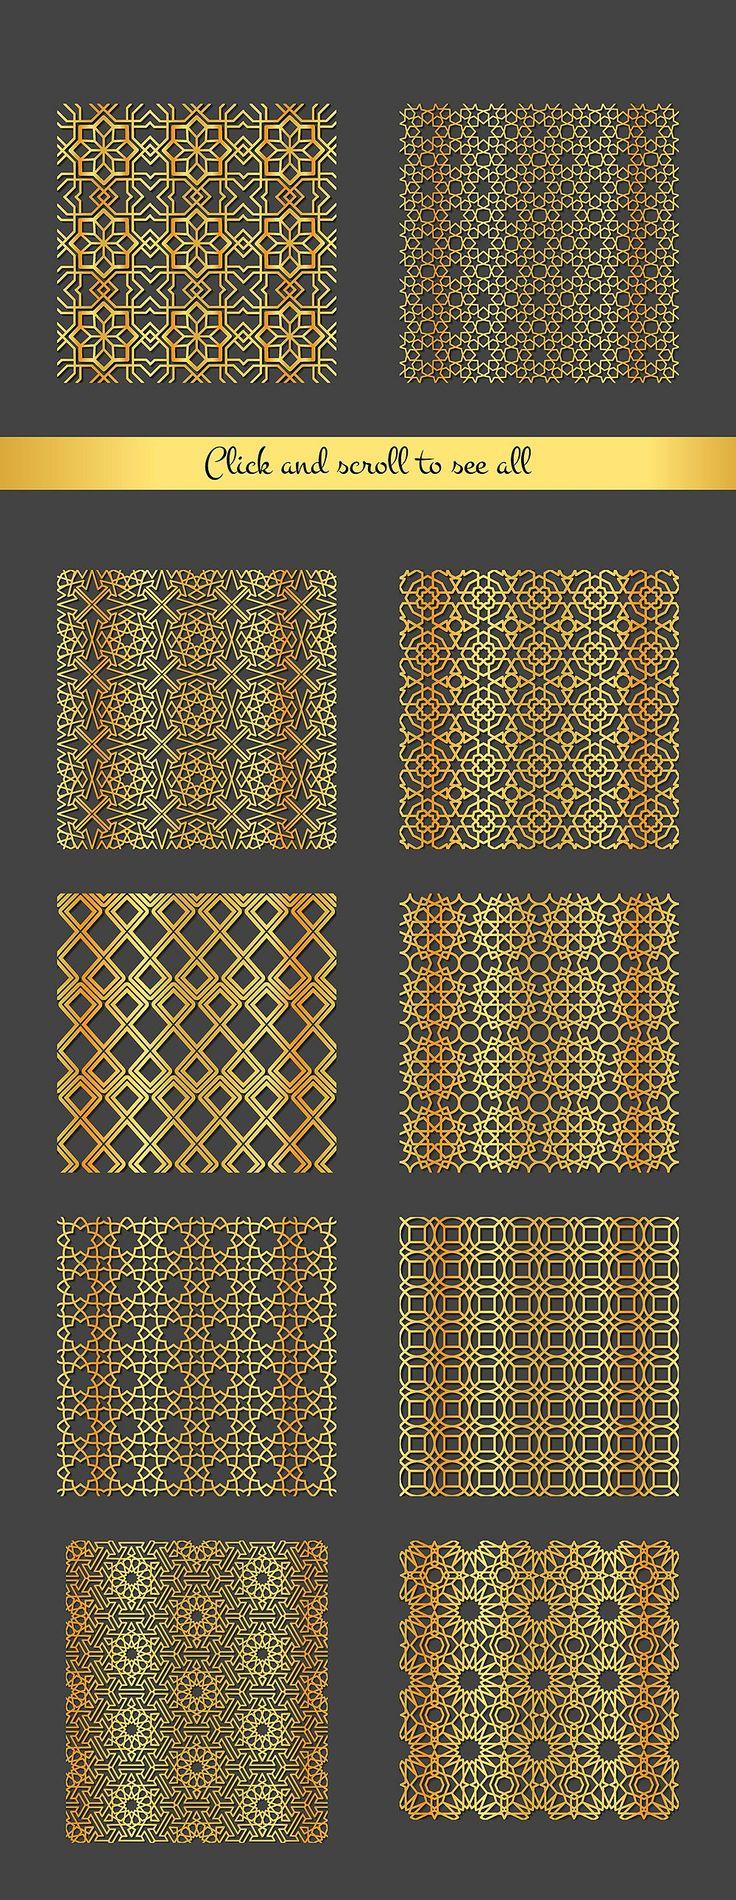 Arabic Patterns set by Katyr on @creativemarket